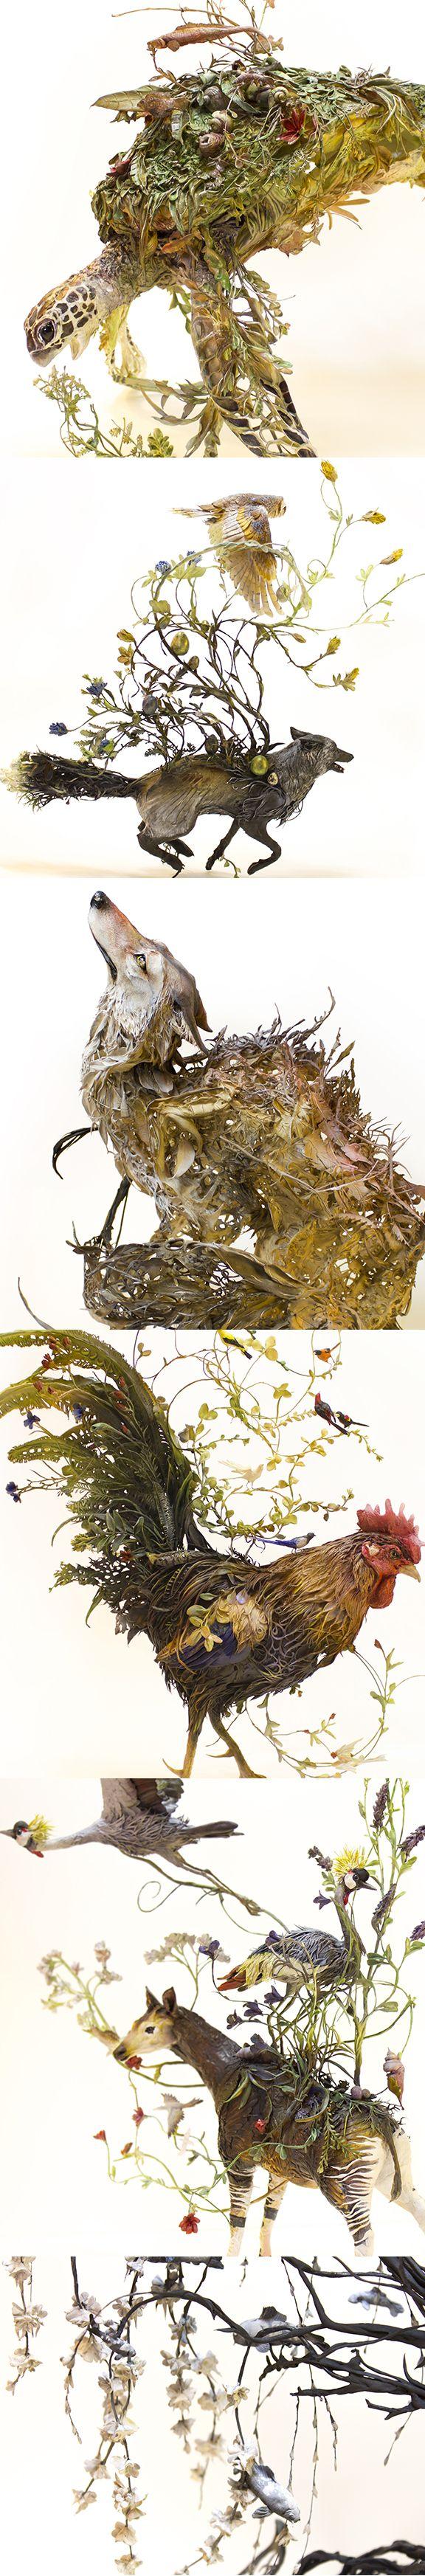 Ellen Jewett sculpture - new work 2015 - turtle fox coyote dog rooster chicken okapi crane koi fish